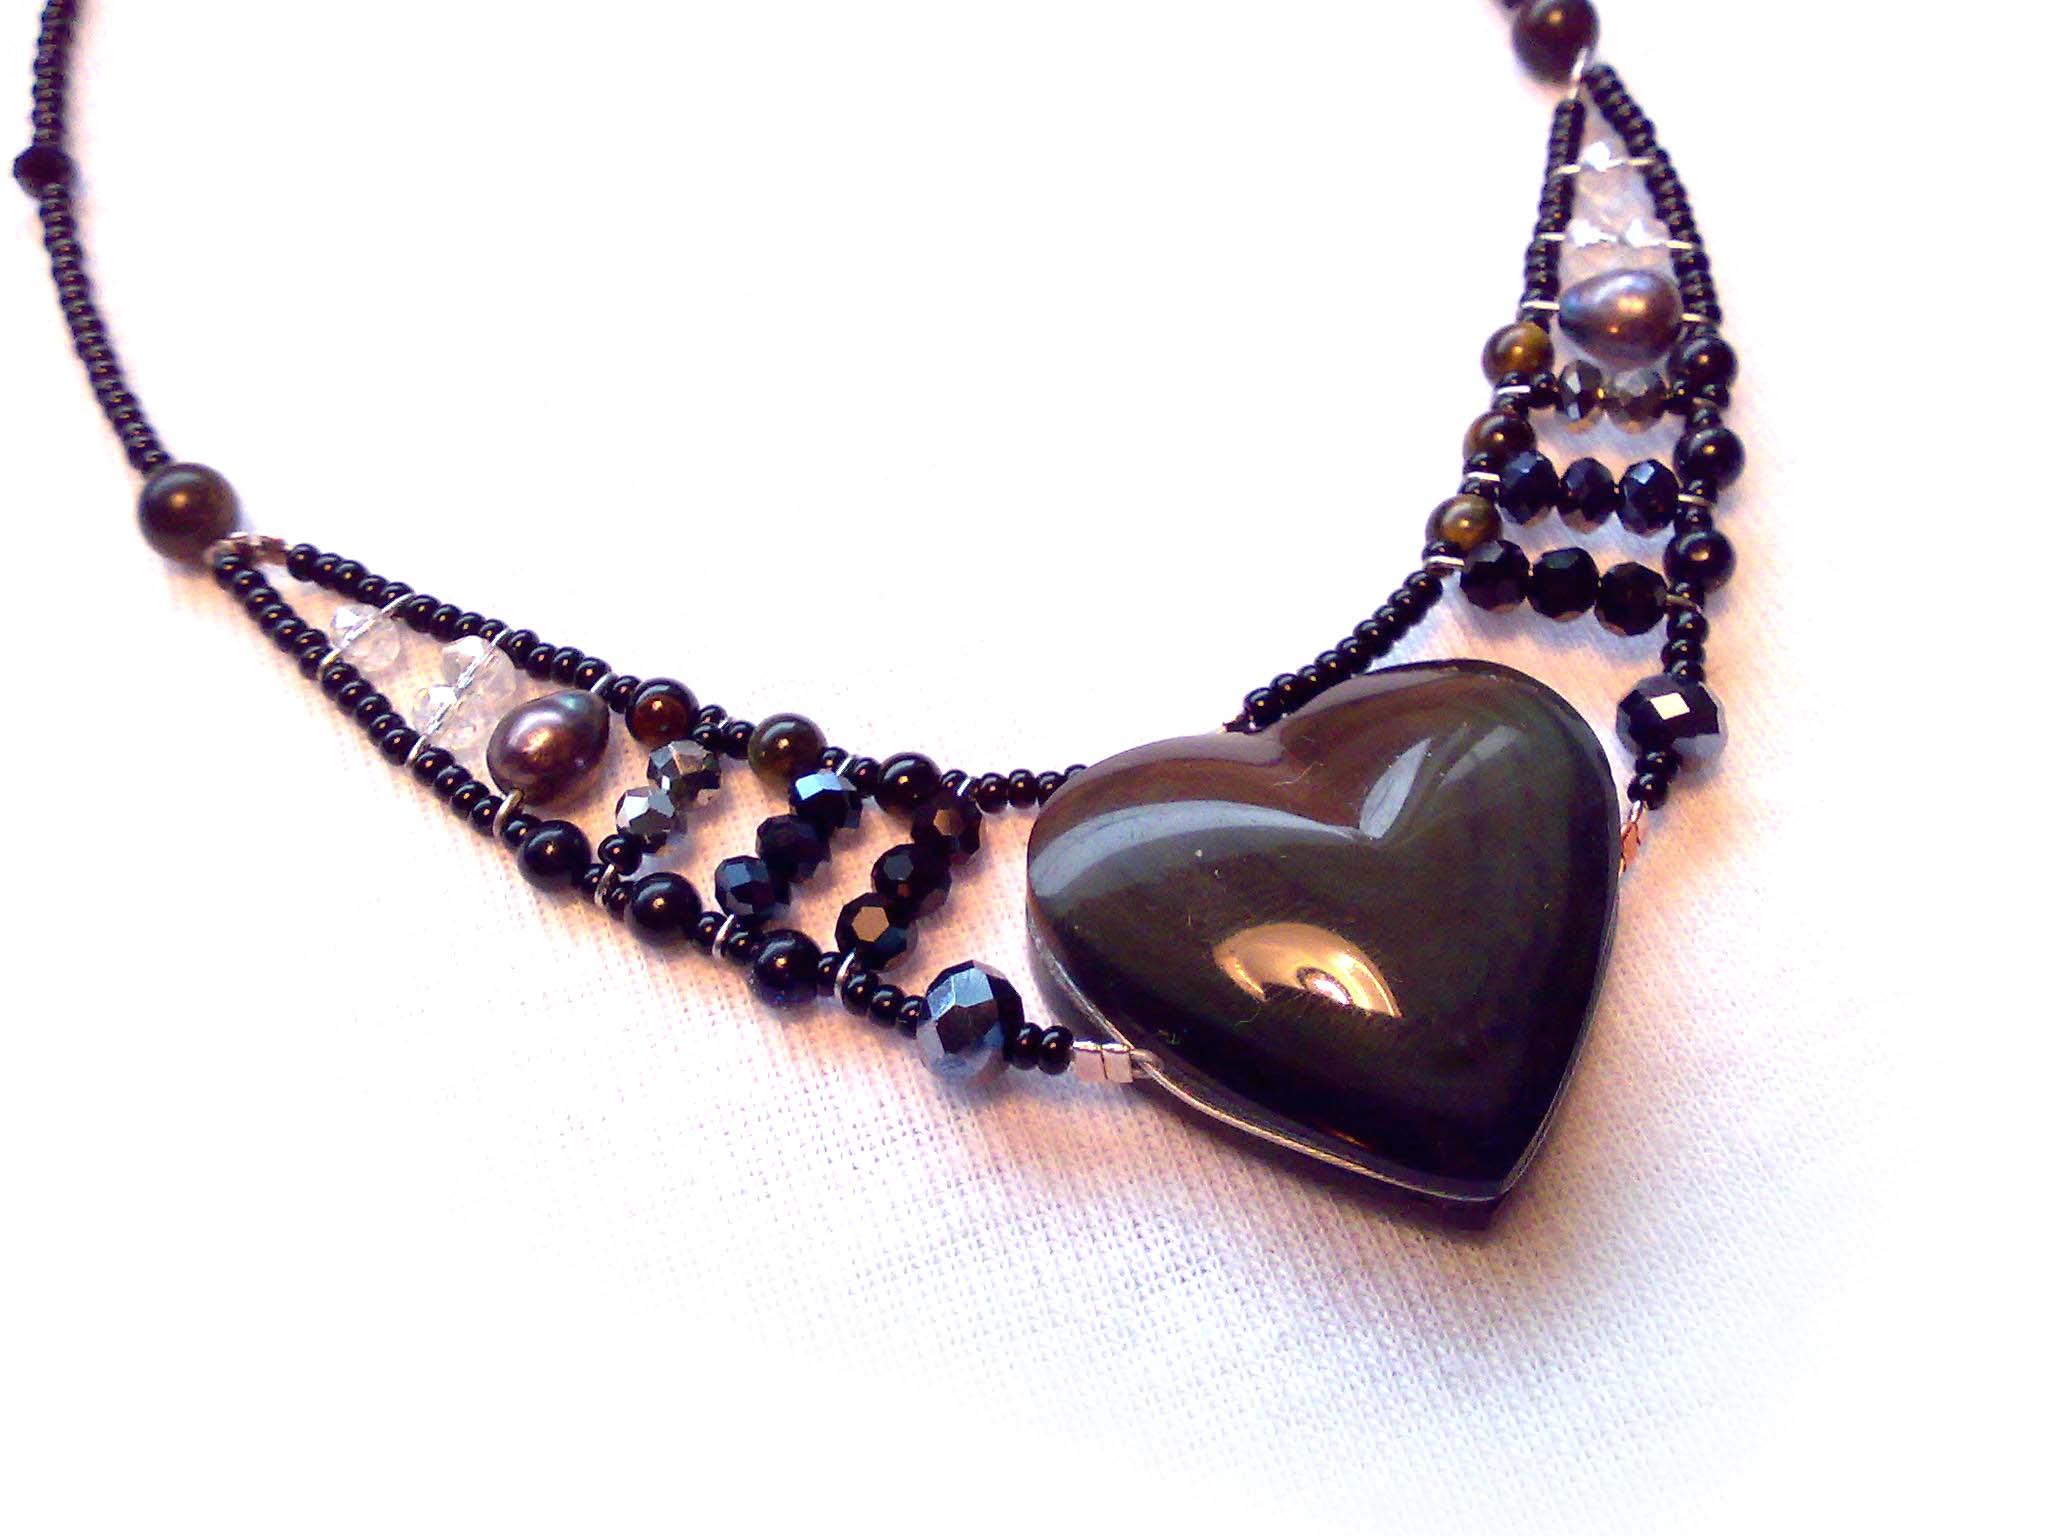 Obsidian, Tiger's Eye, Freshwater Pearl, Swarovski Crystals, Sterling Silver branded tag.